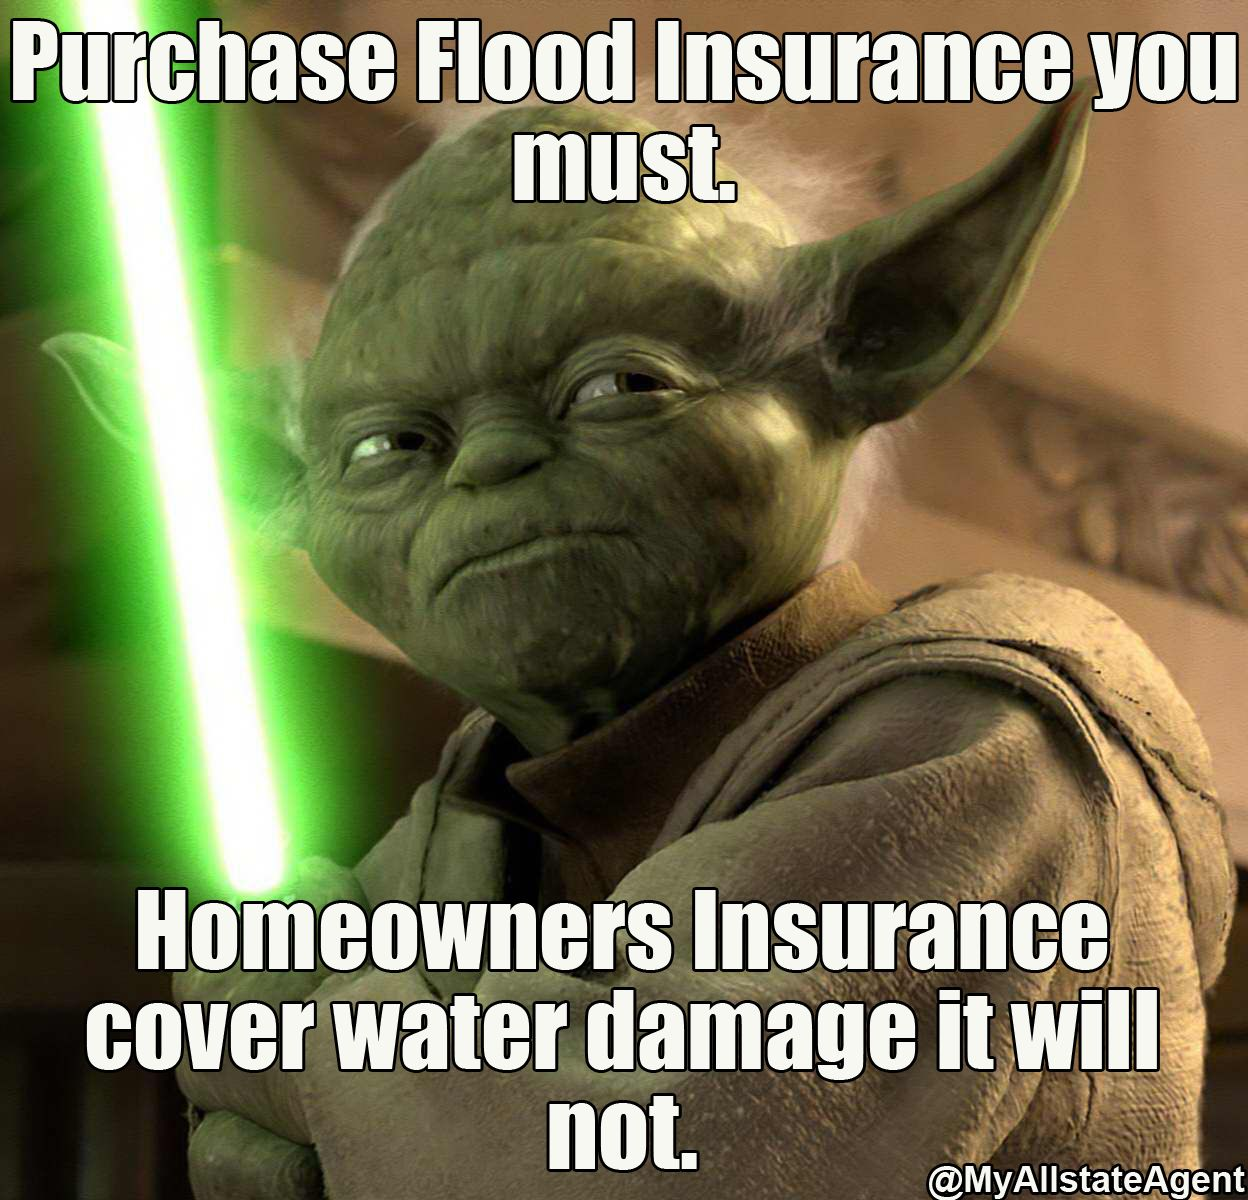 Insurance Meme Google Search Star Wars Yoda Star Wars Characters Star Wars Film